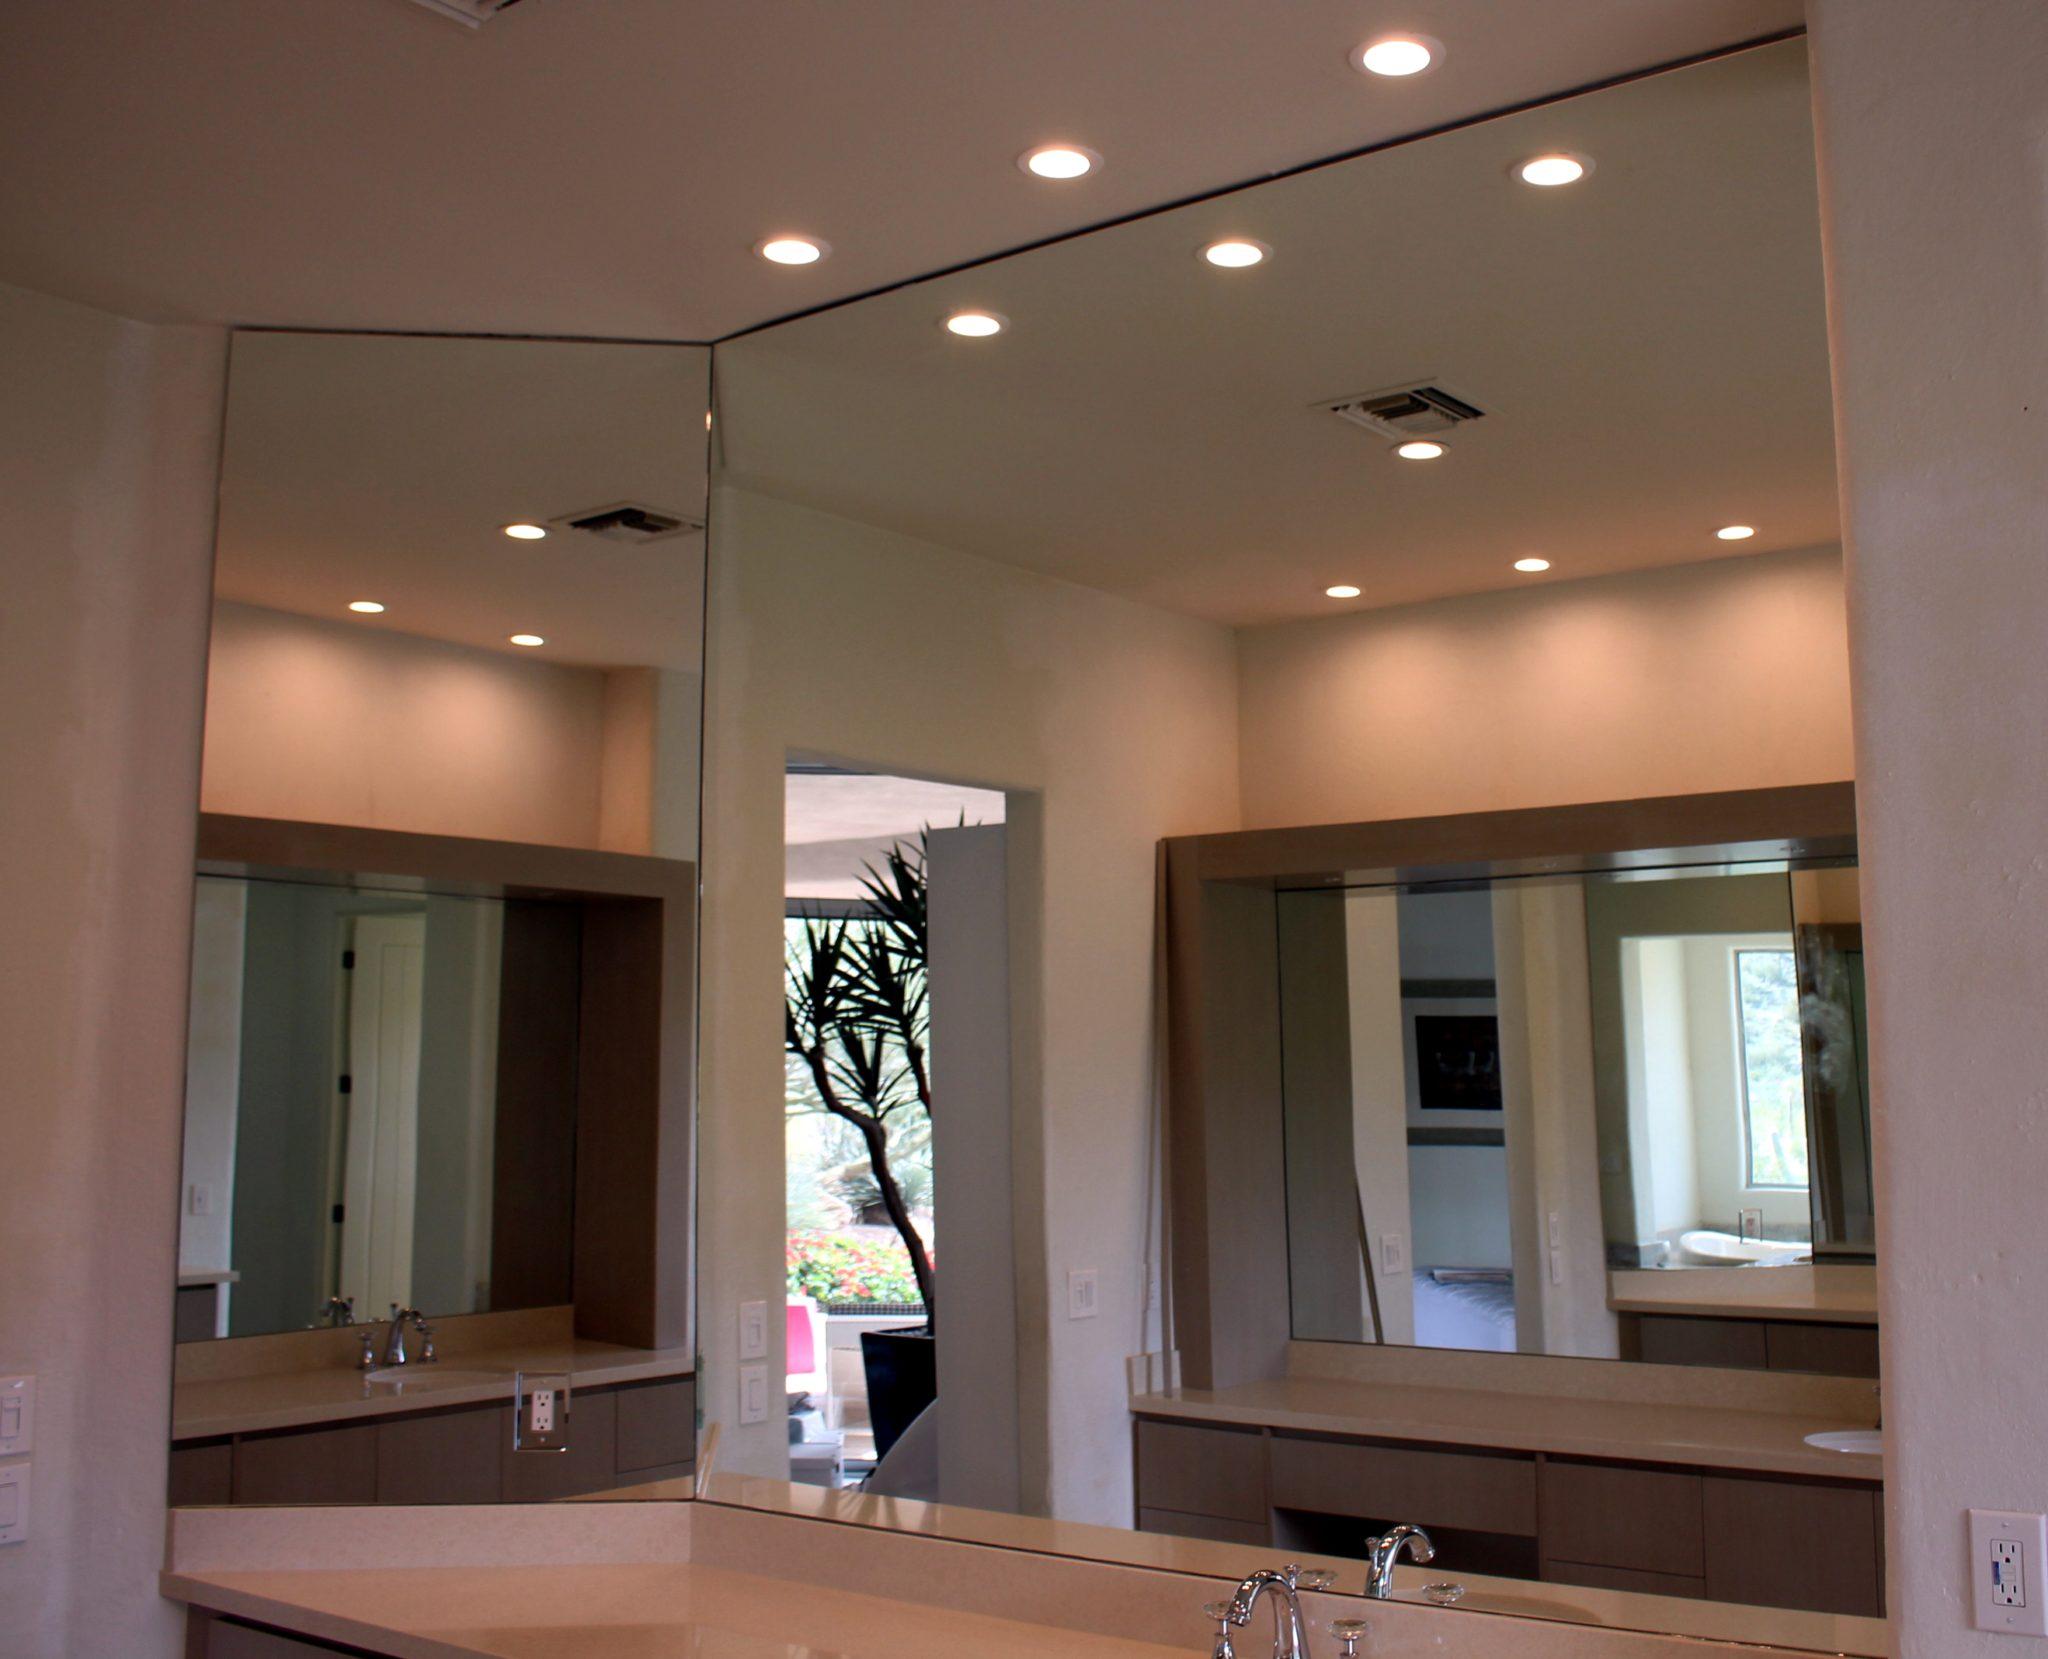 Bathroom Mirror Size bathroom mirrors | a cut above glass